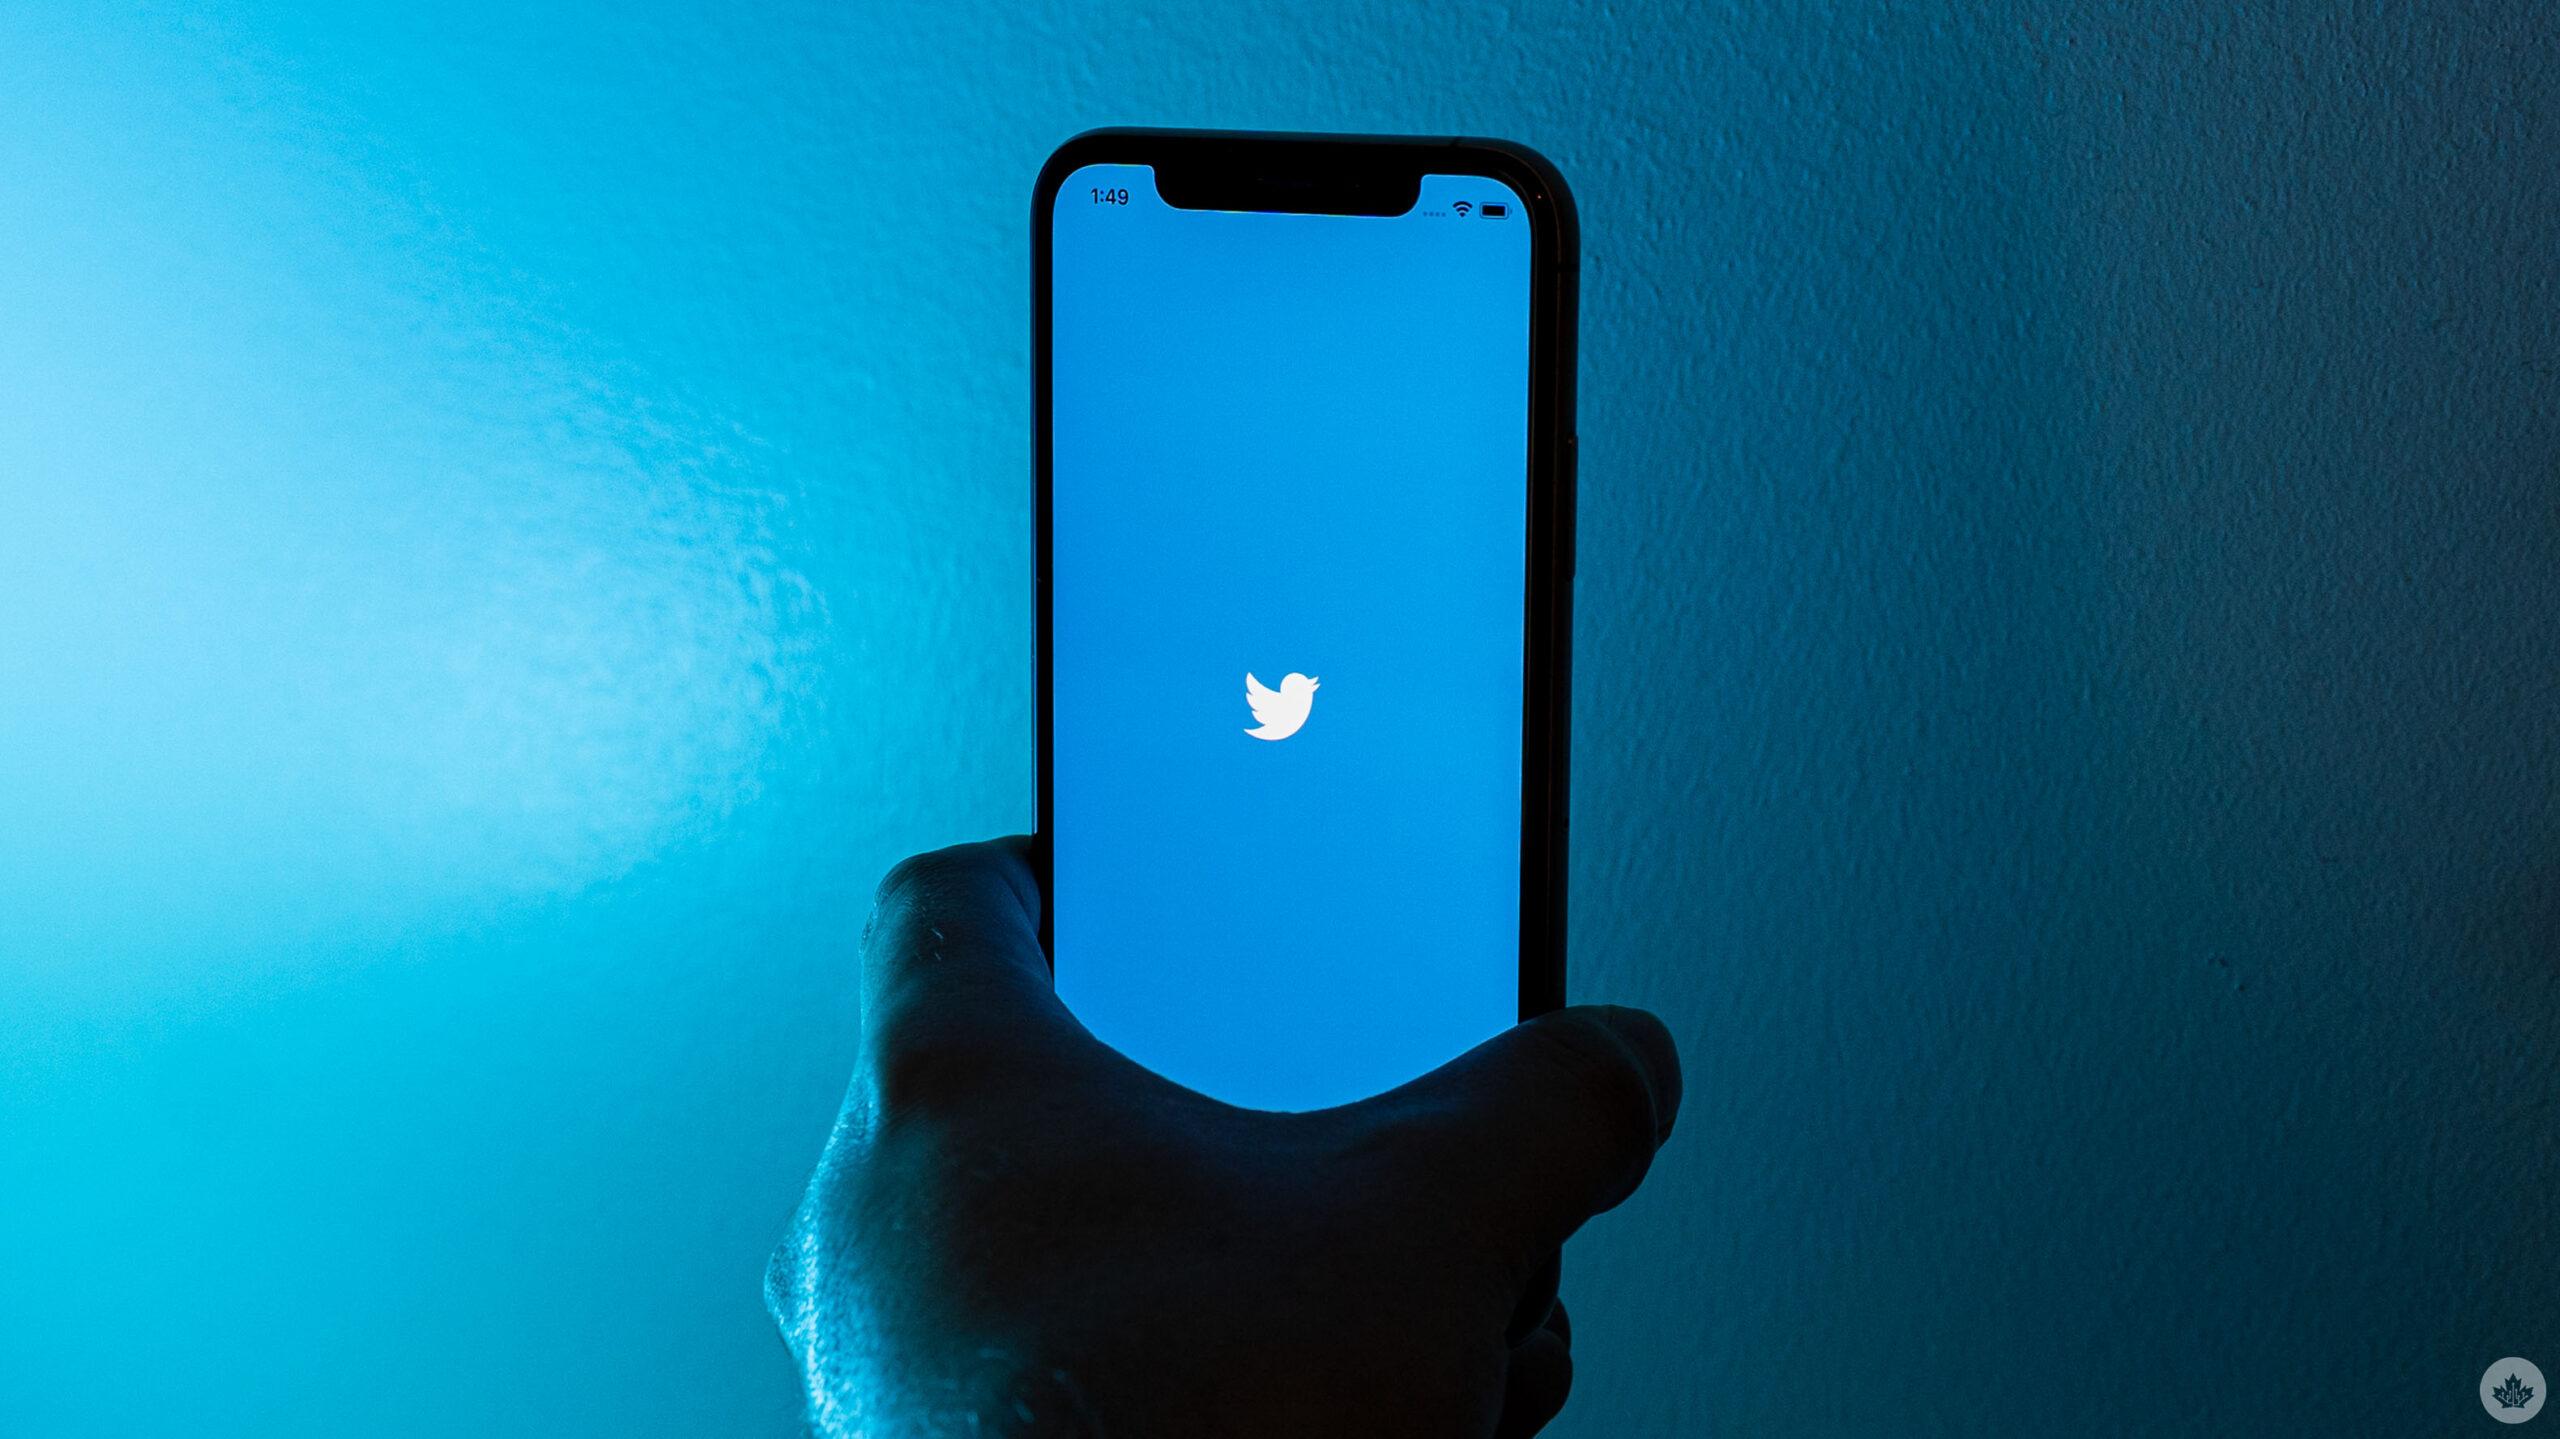 Twitter logo on iPhone